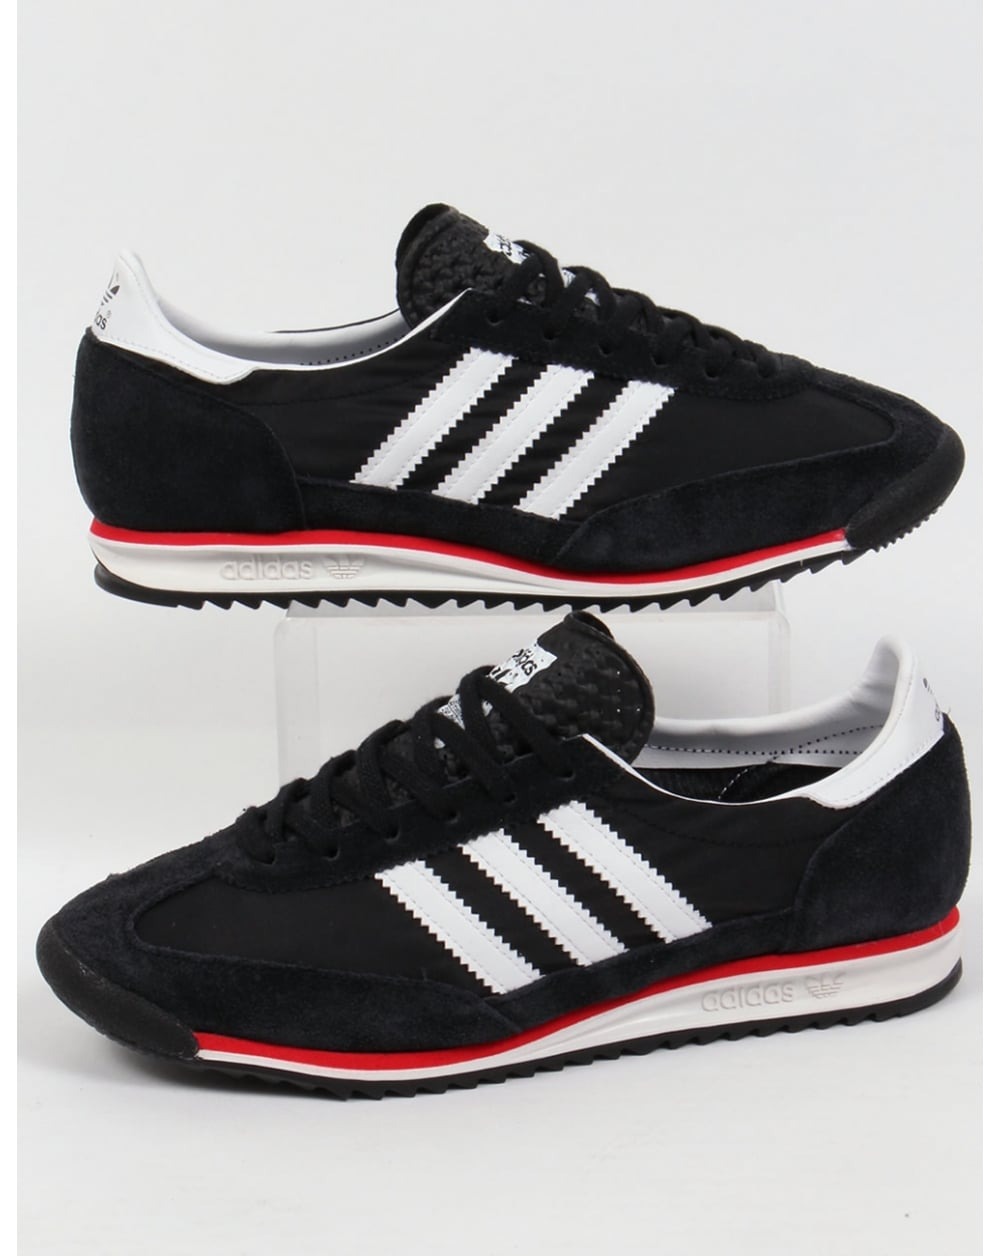 Adidas Sl 72 Trainers Black/white/red